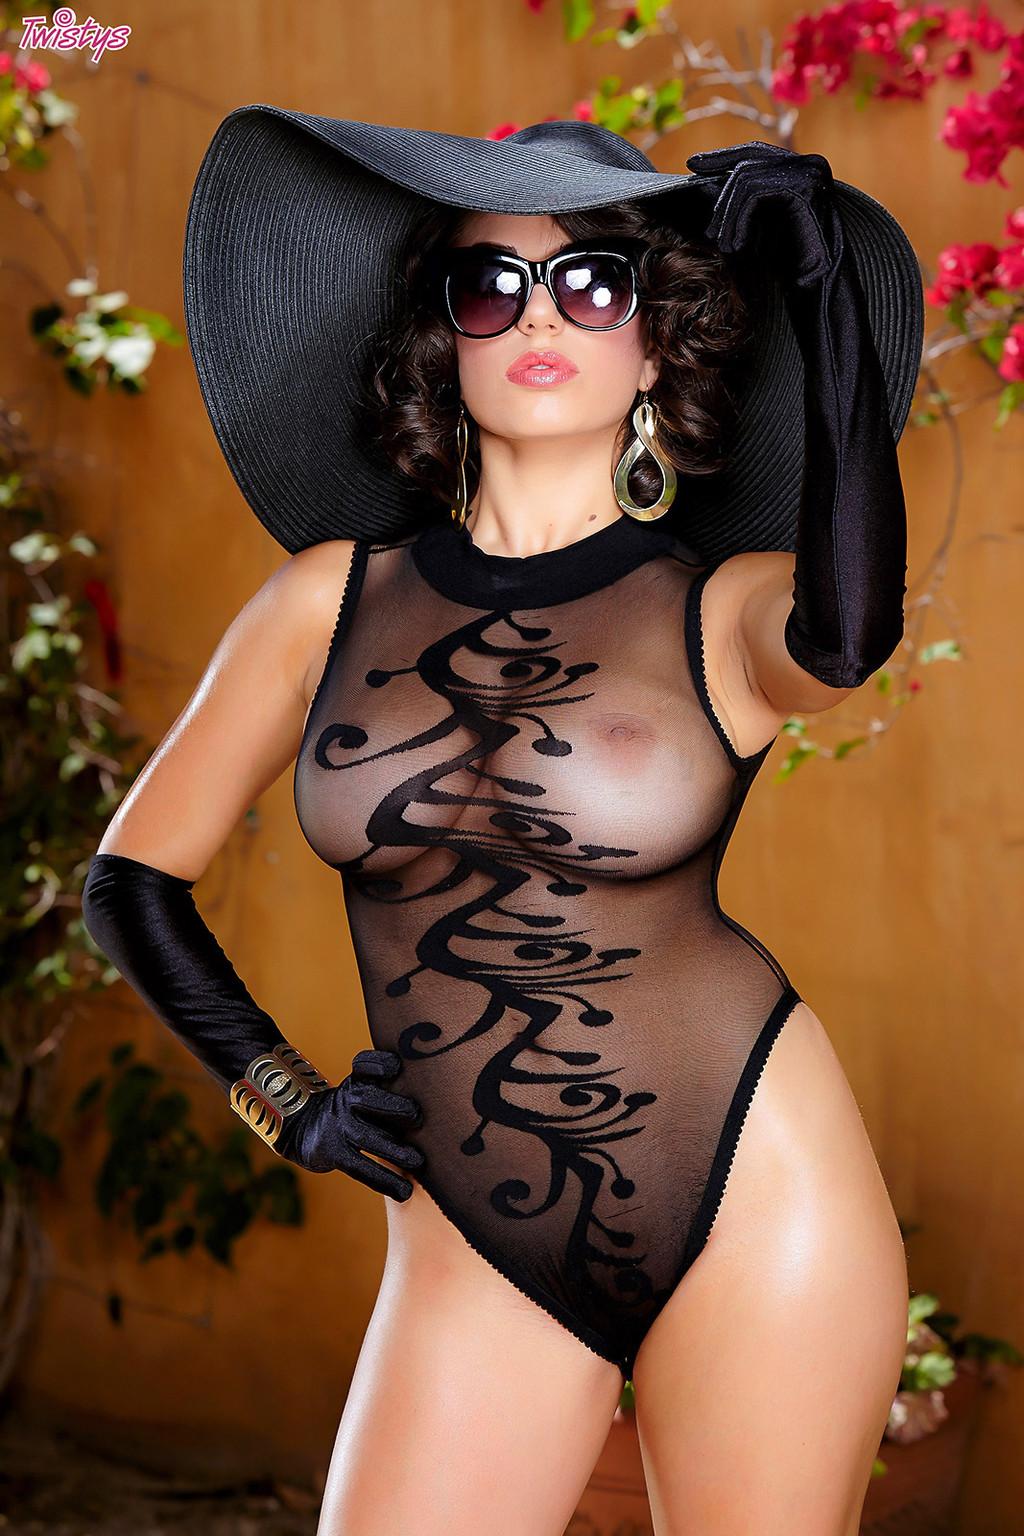 glamurnaya-erotika-dam